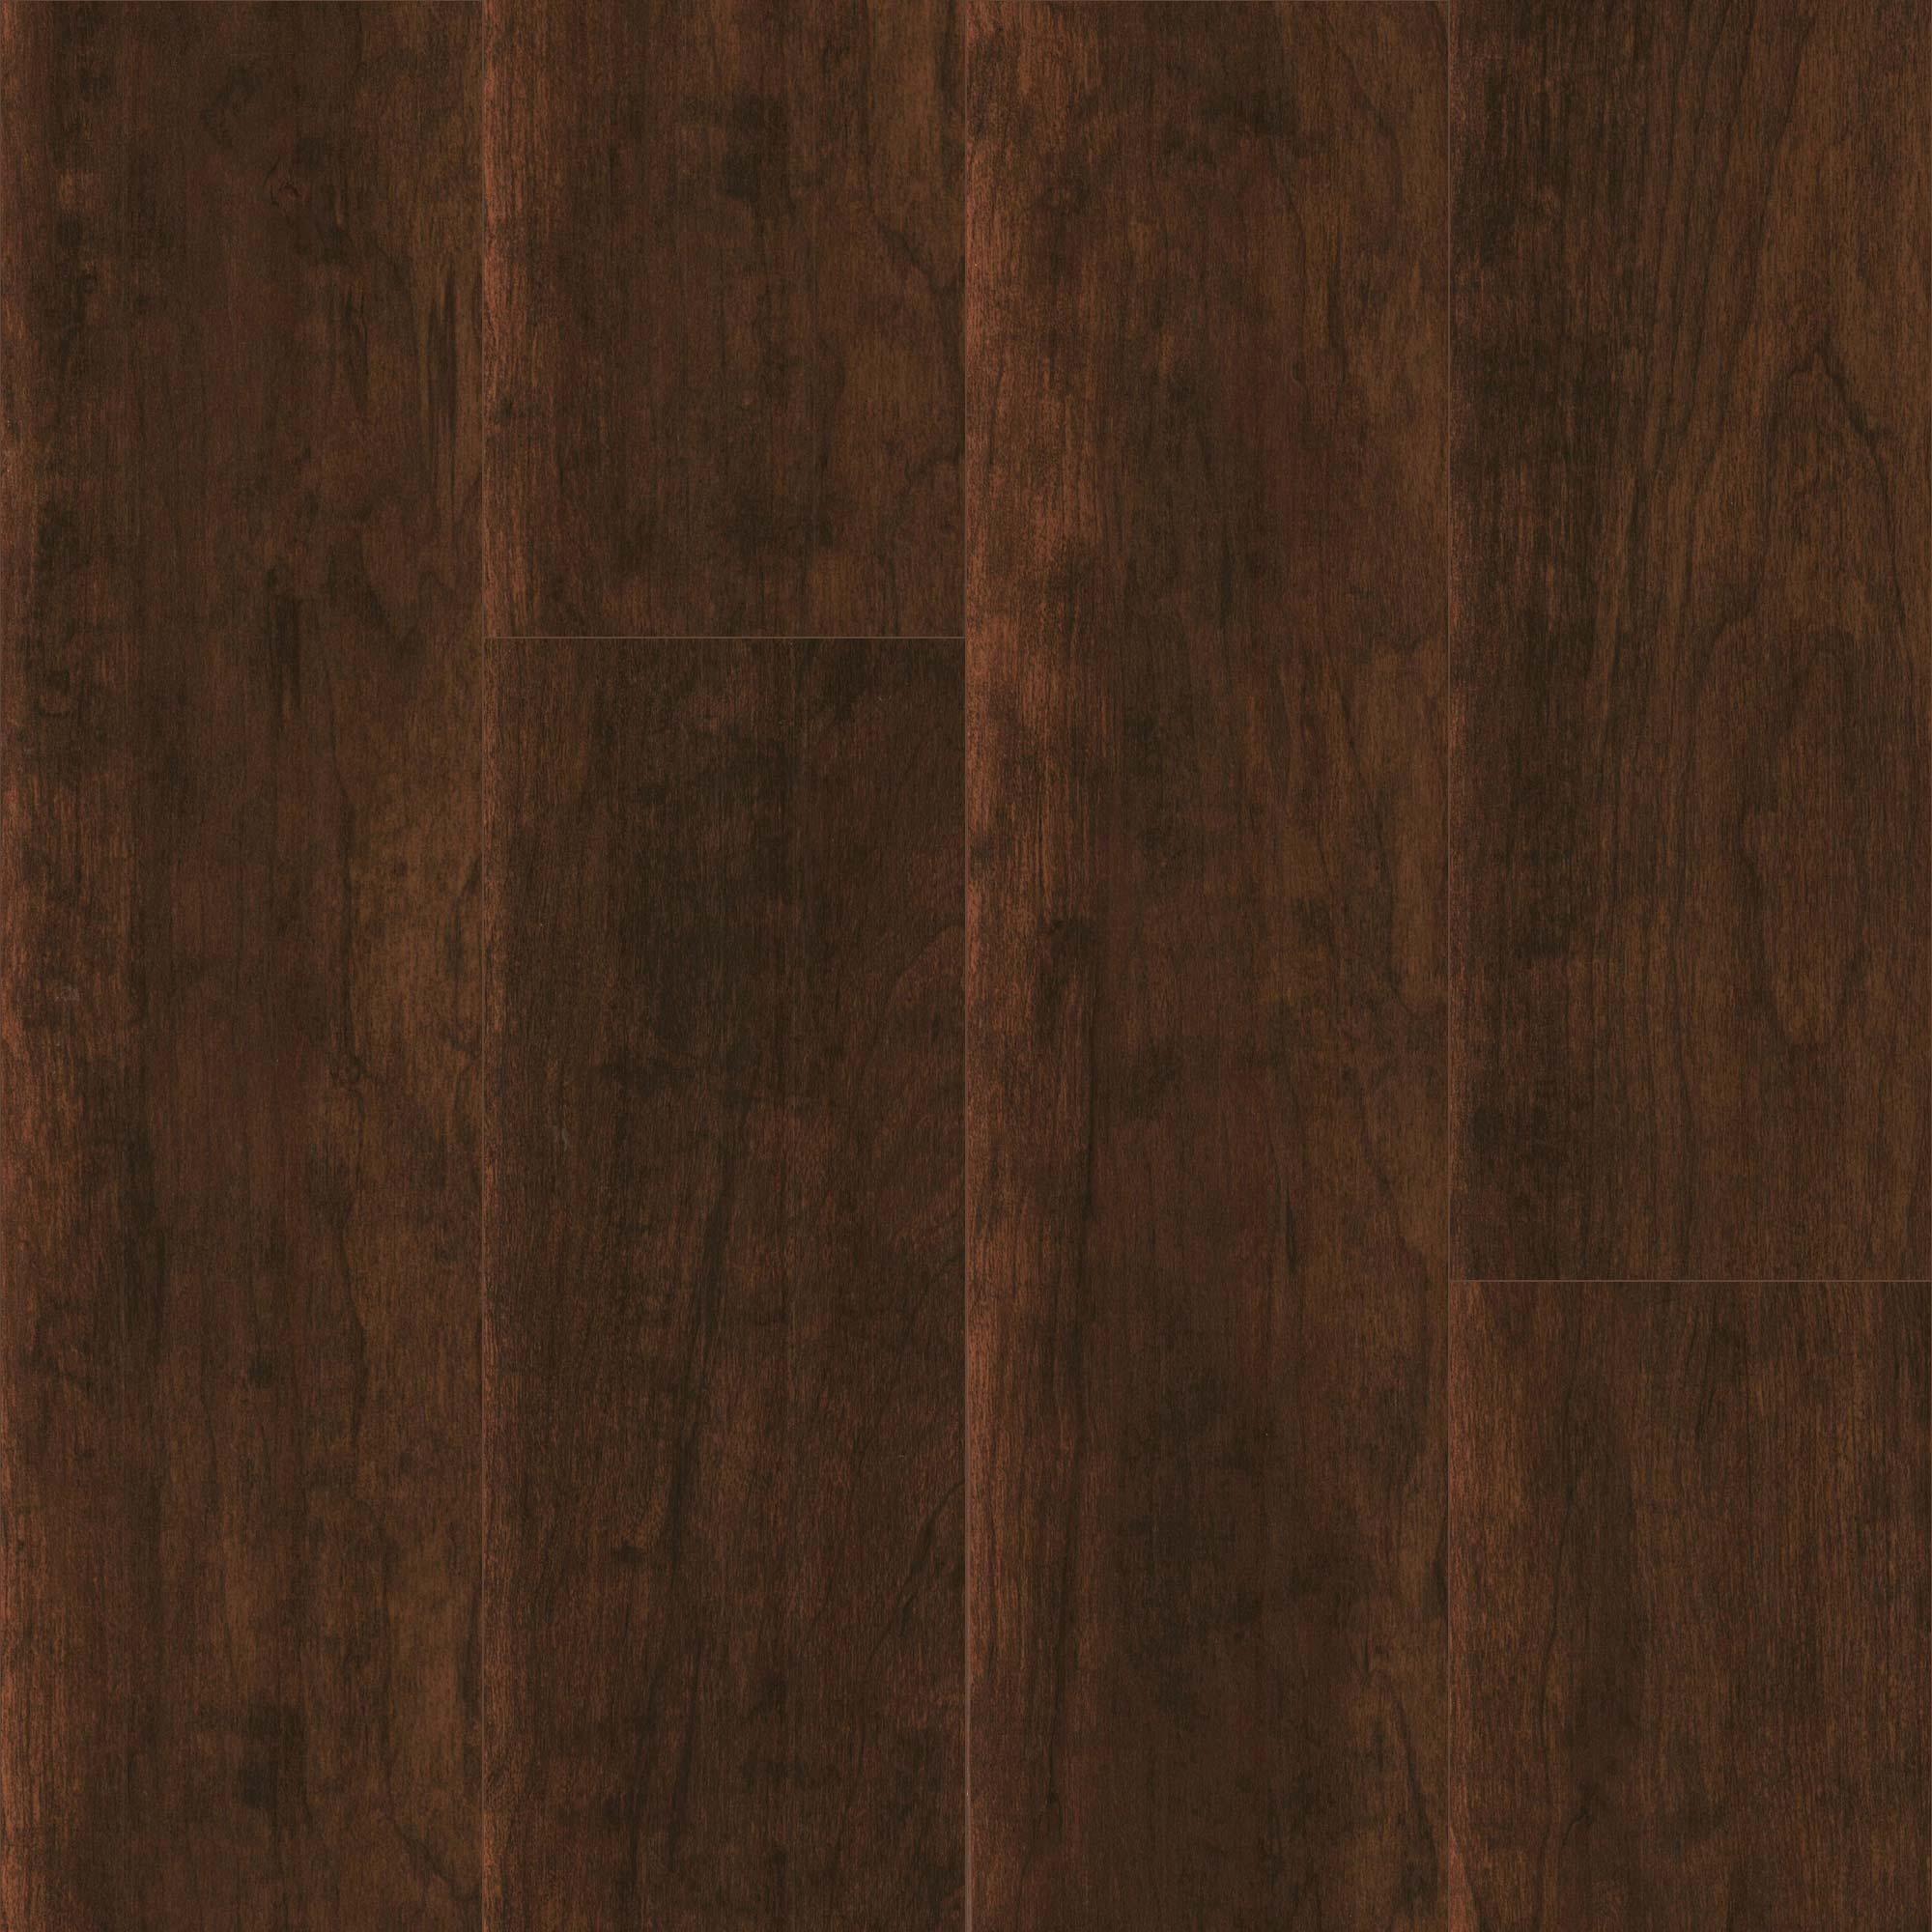 Supreme Click Panama Cherry High Gloss 10 3mm Laminate Flooring With Attached Pad Laminate Flooring Laminate Flooring